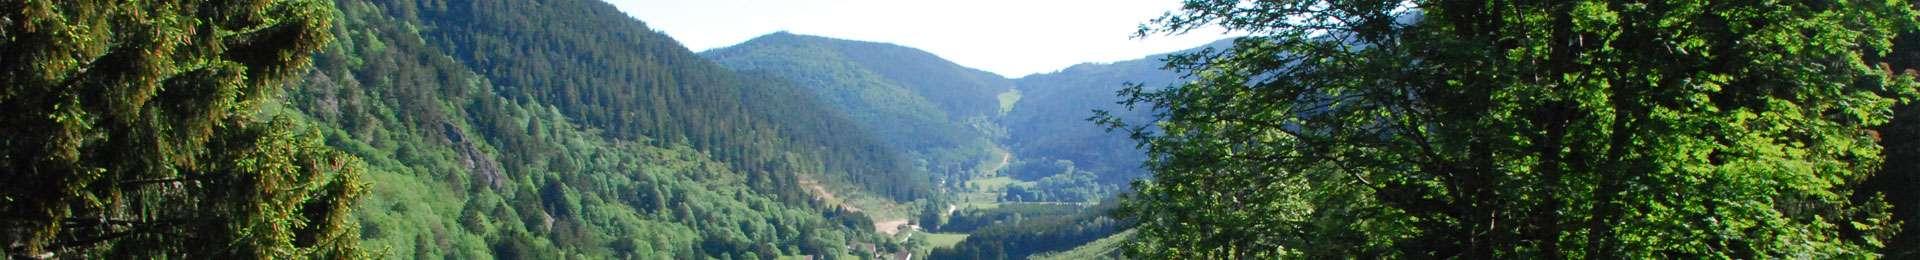 Vue vallée Le Valtin